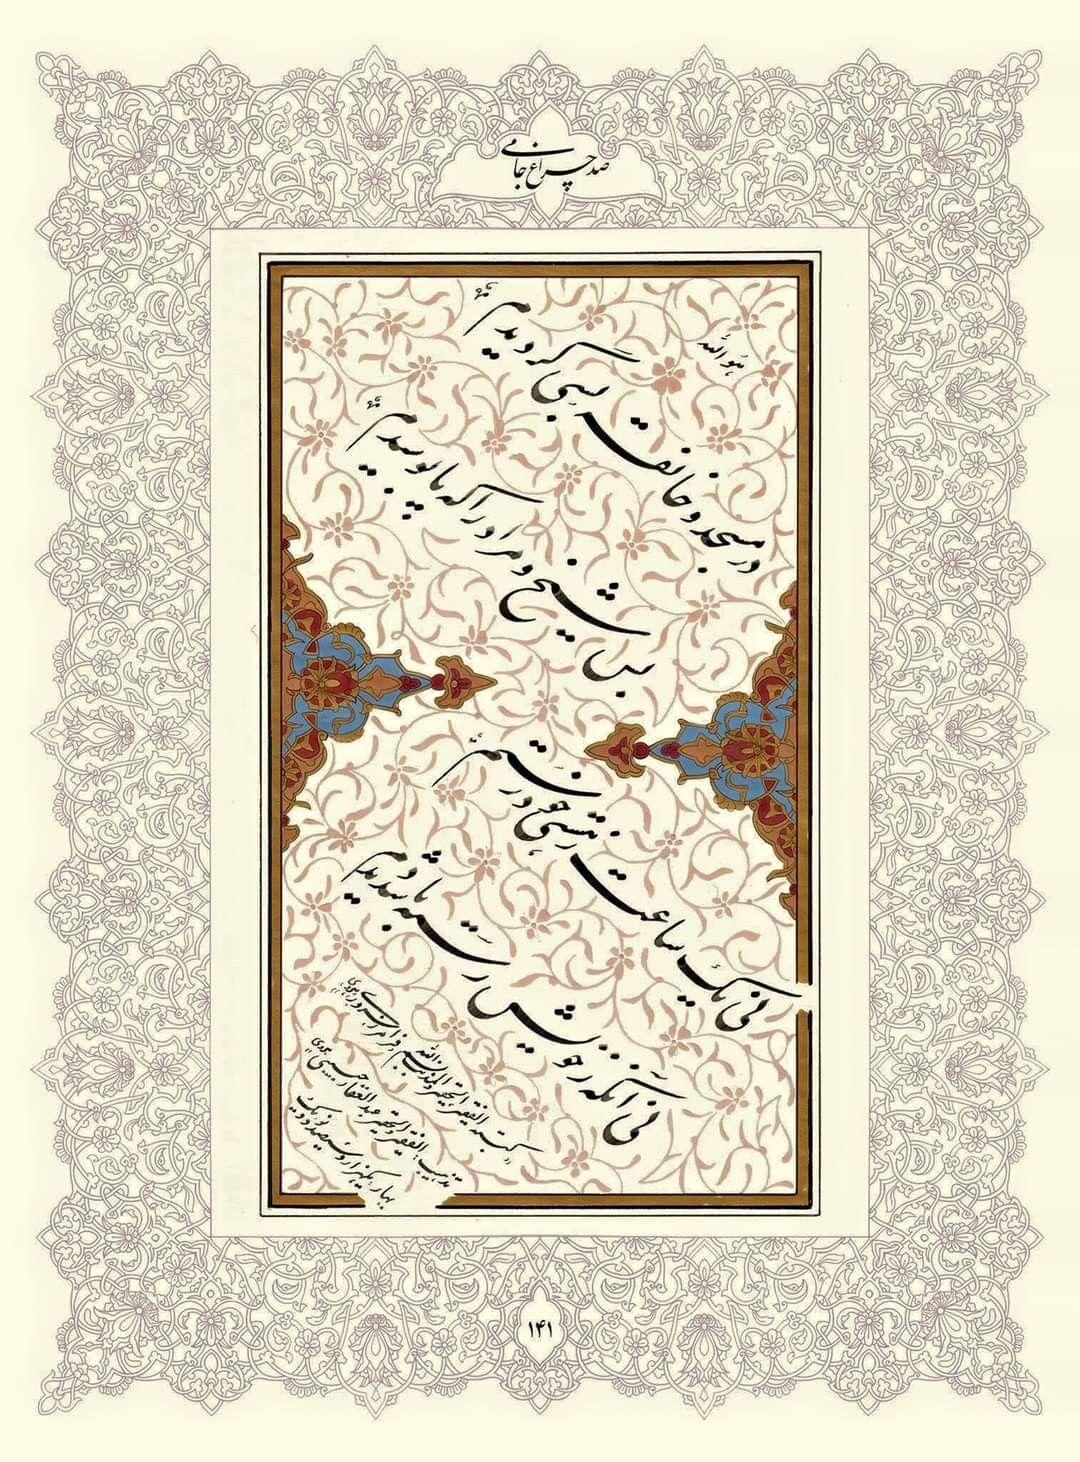 Pin By Omar Radwan On فارسی نستعلیق خطاطی Vintage World Maps Decor Home Decor